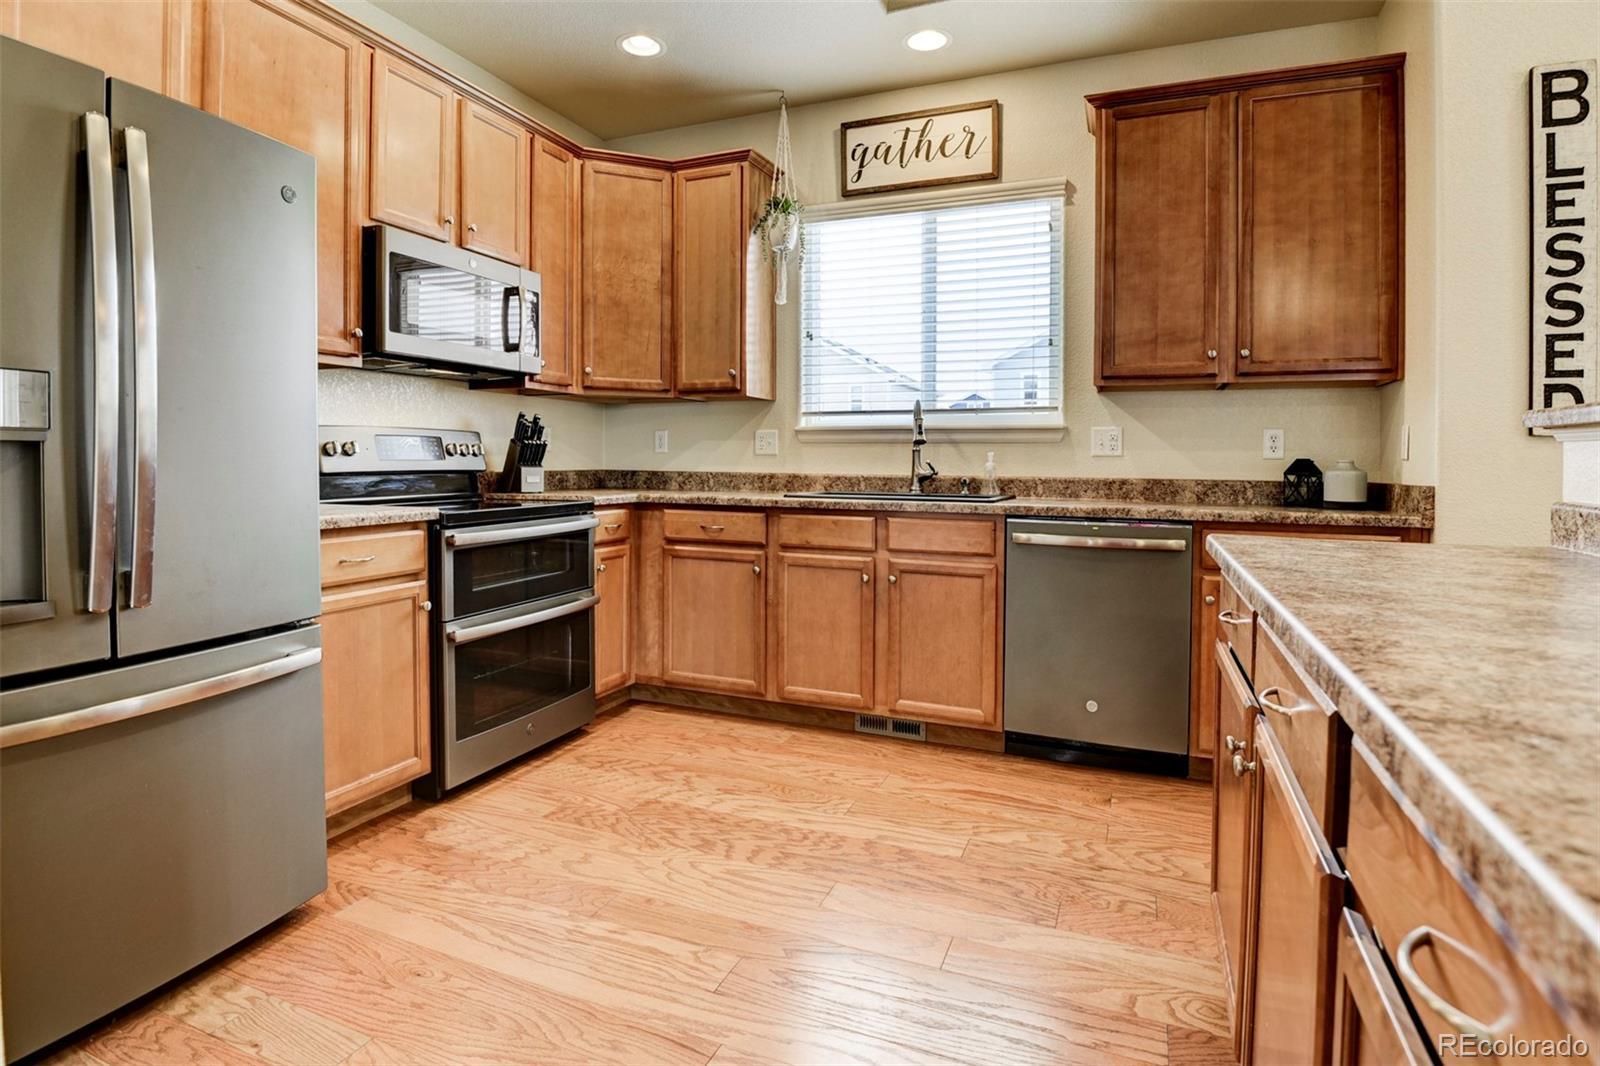 MLS# 7612924 - 8 - 6139 Rocking Chair Lane, Colorado Springs, CO 80925